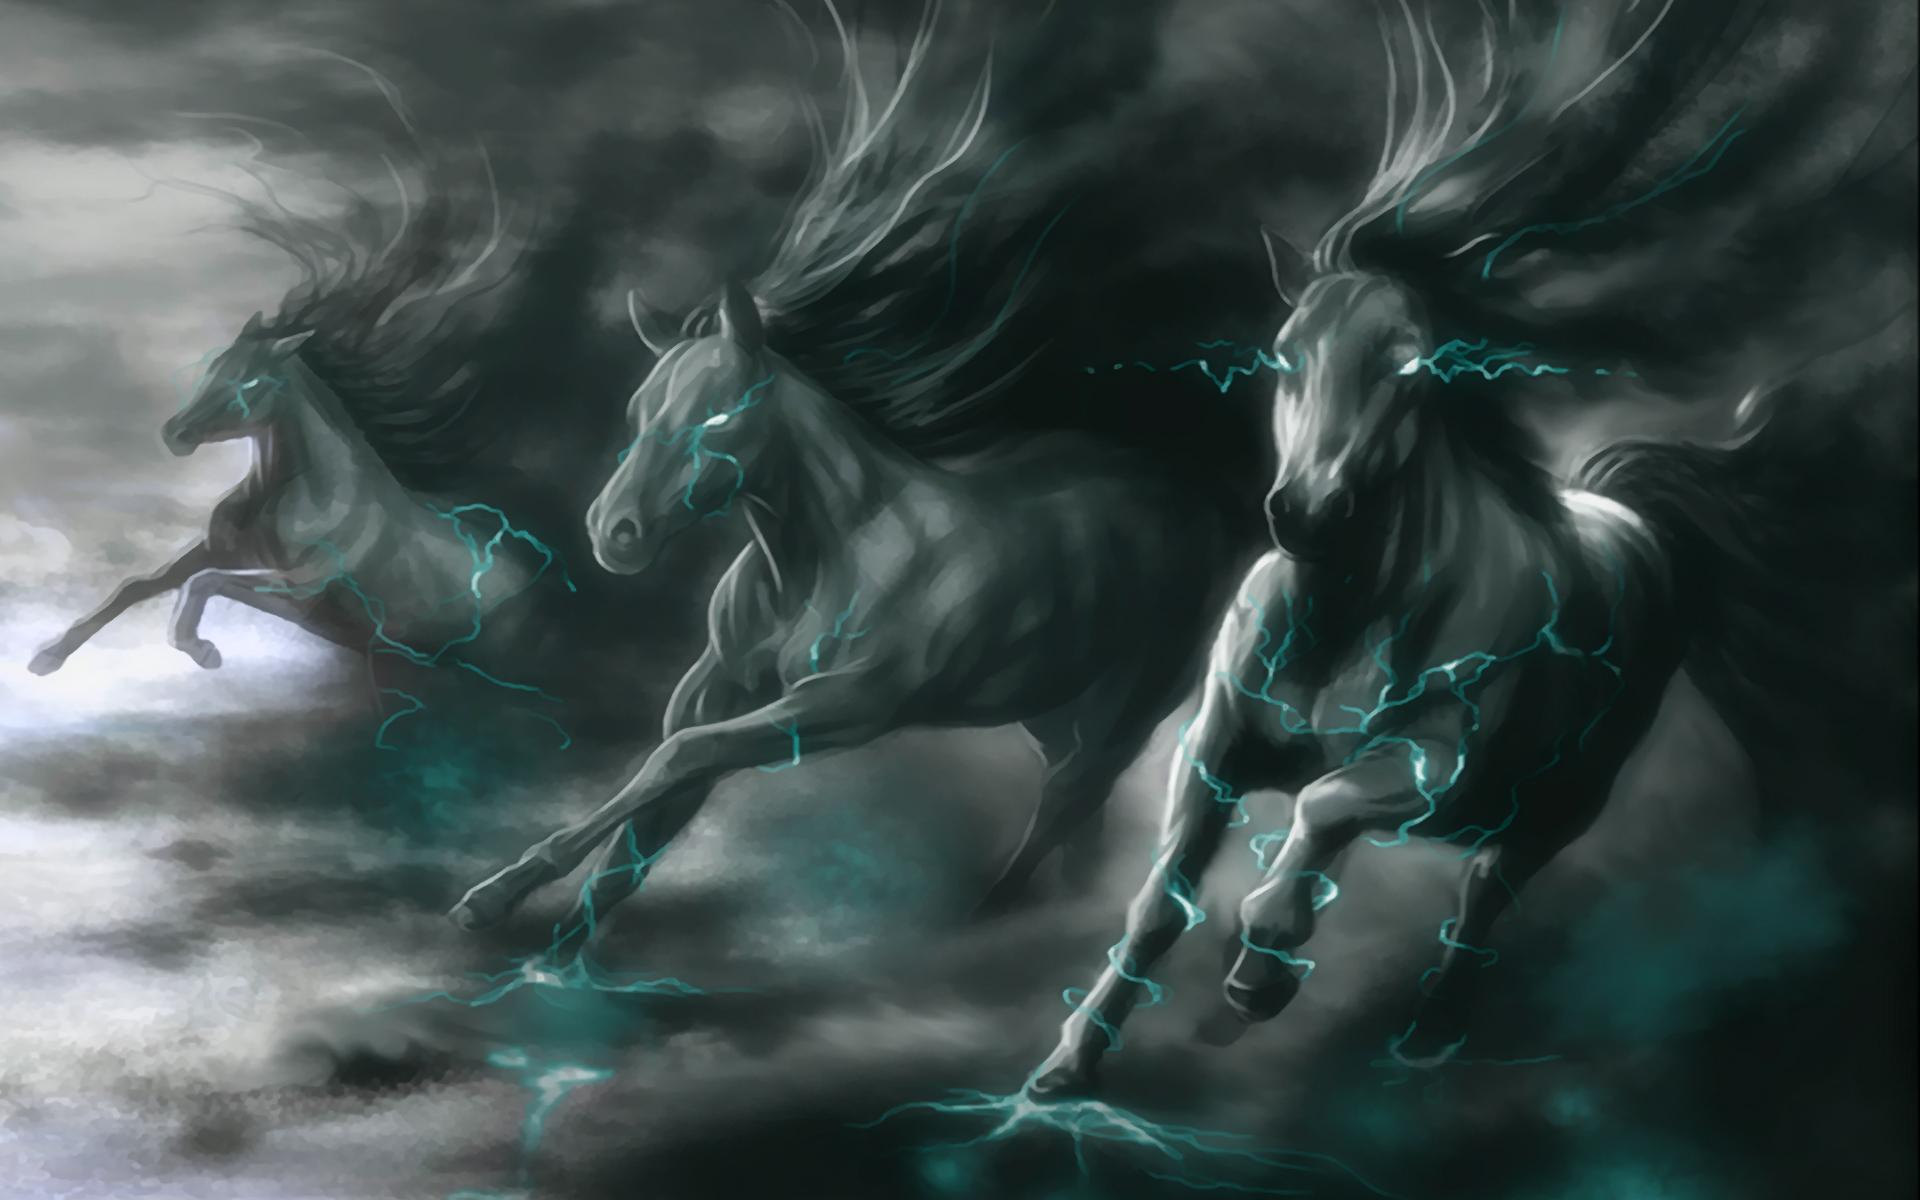 wallpaper horse tonight welshdragon - photo #4